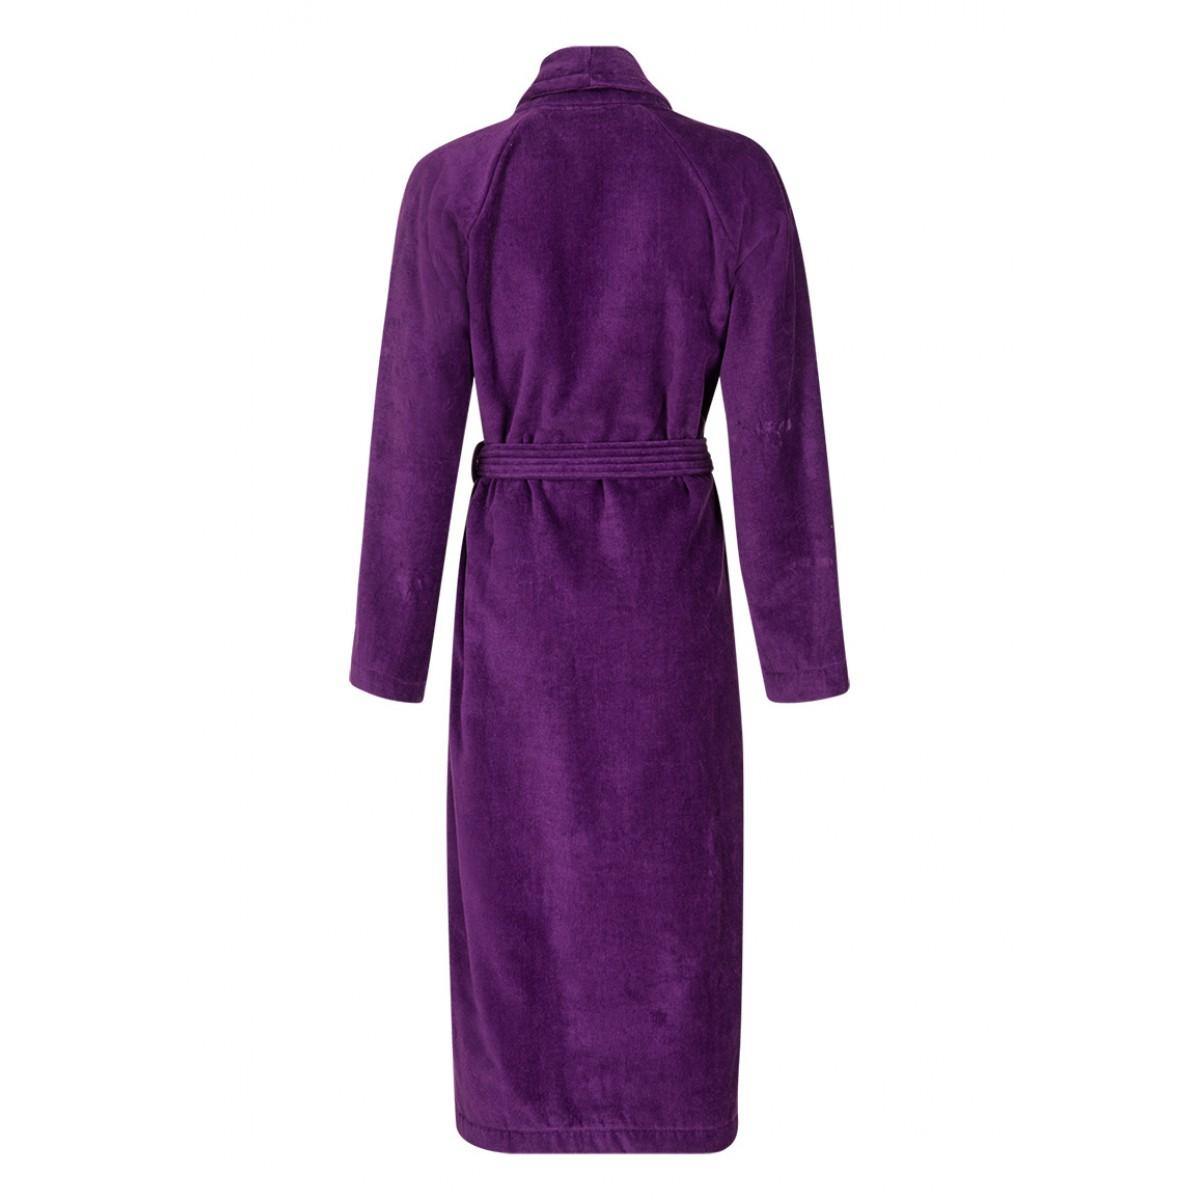 Bademantel violett